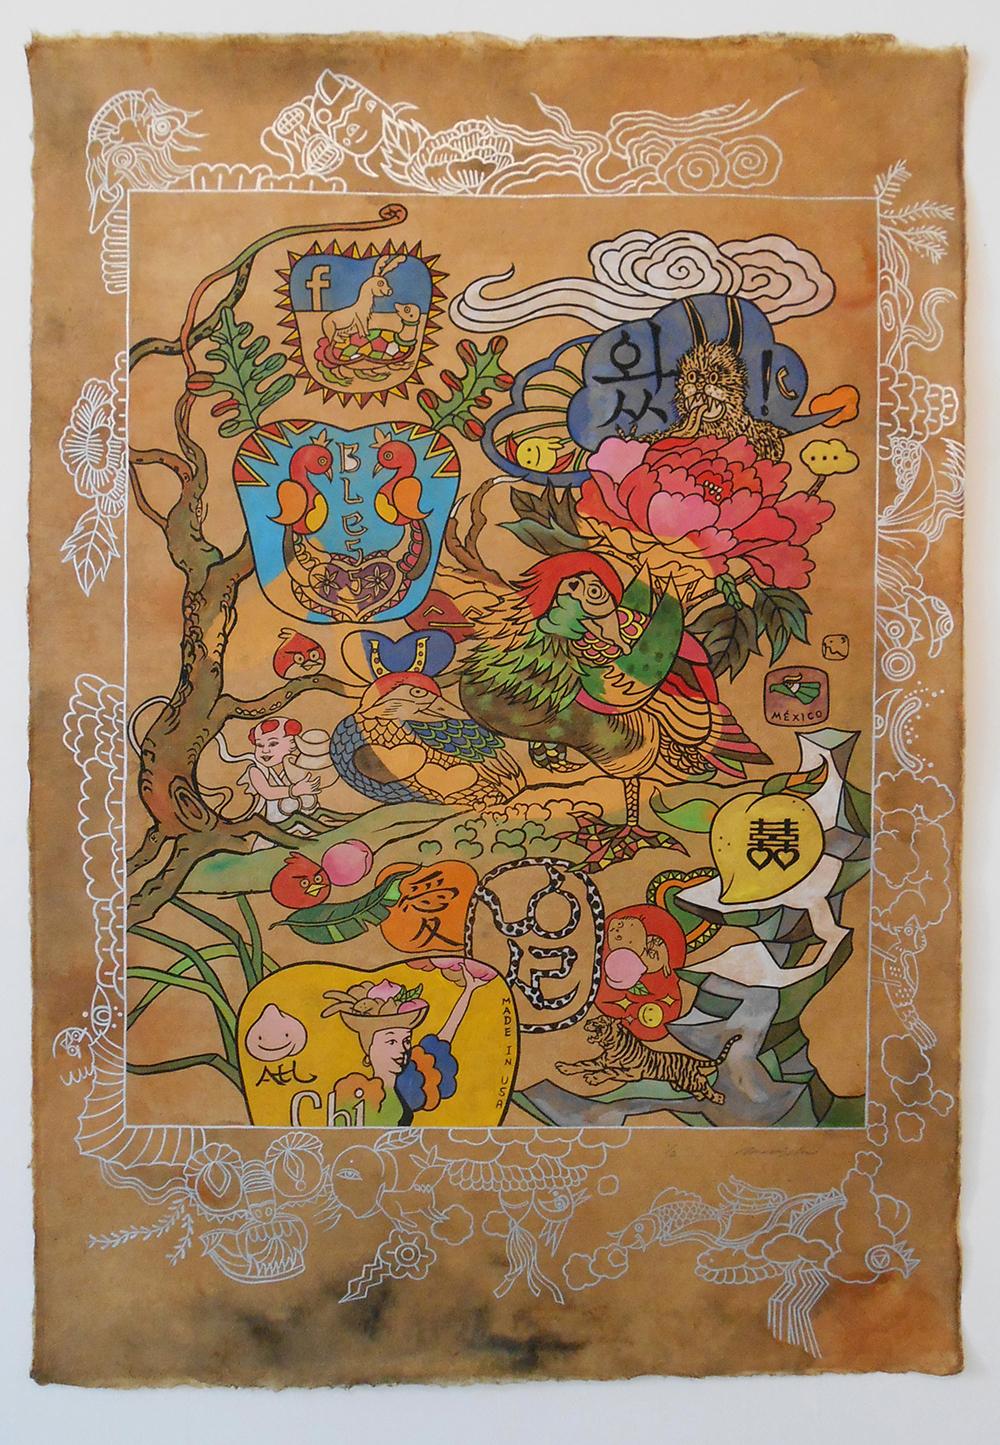 "Jiha Moon  Forever Couplehood  Ink, acrylic, screen print on Hanji paper 36"" x 25.5"" 2014"